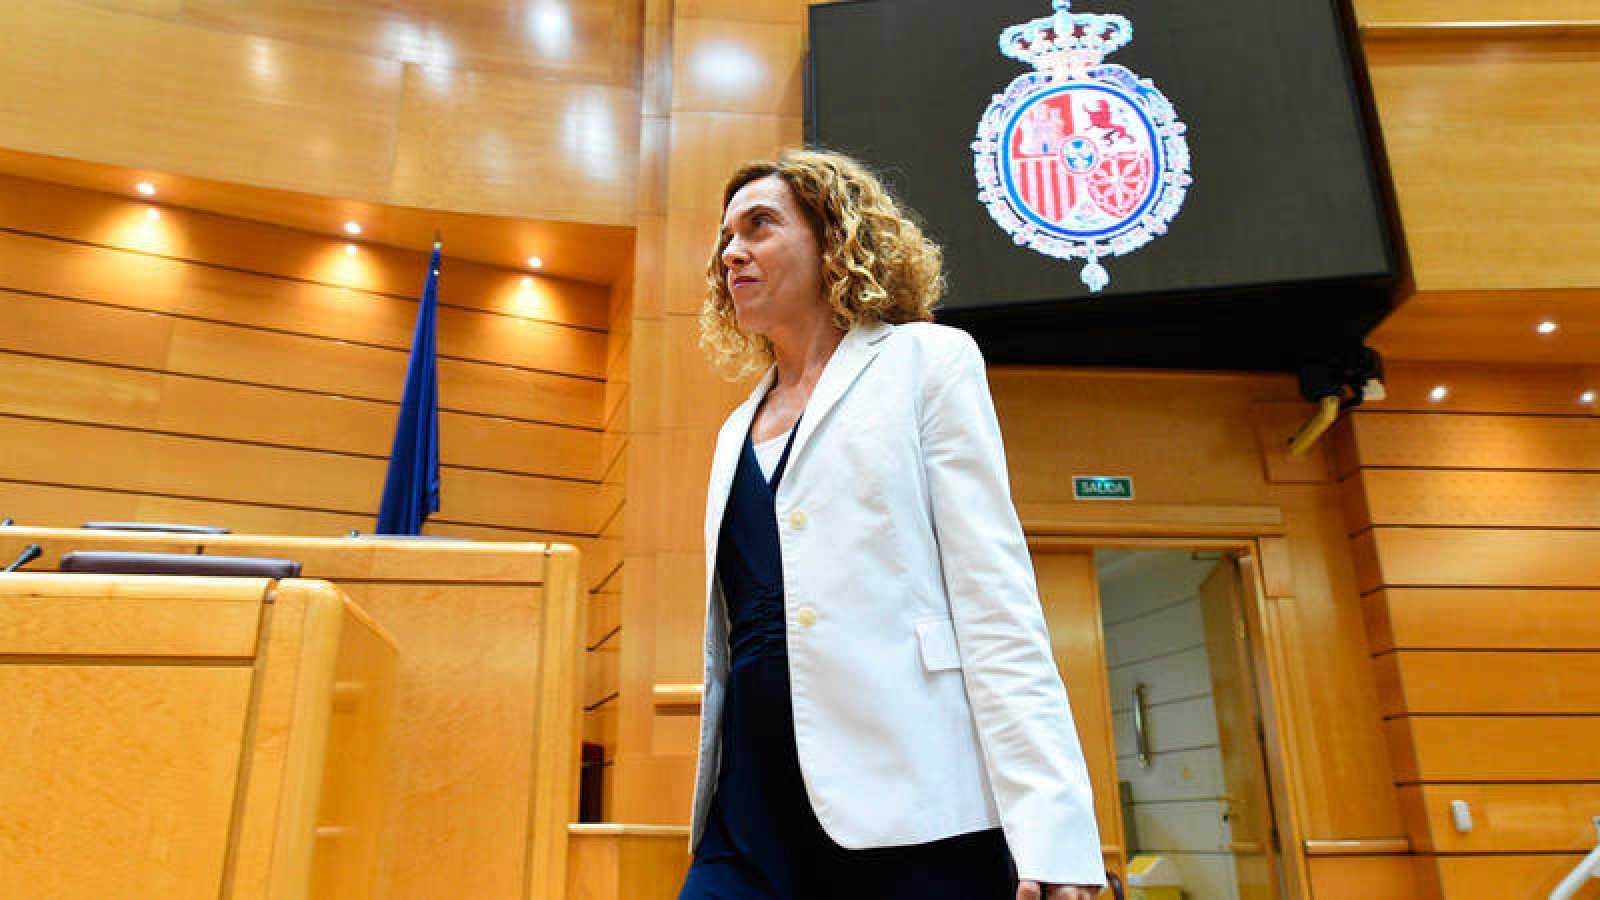 La ministra de Política Territorial, Meritxell Batet, en el Senado